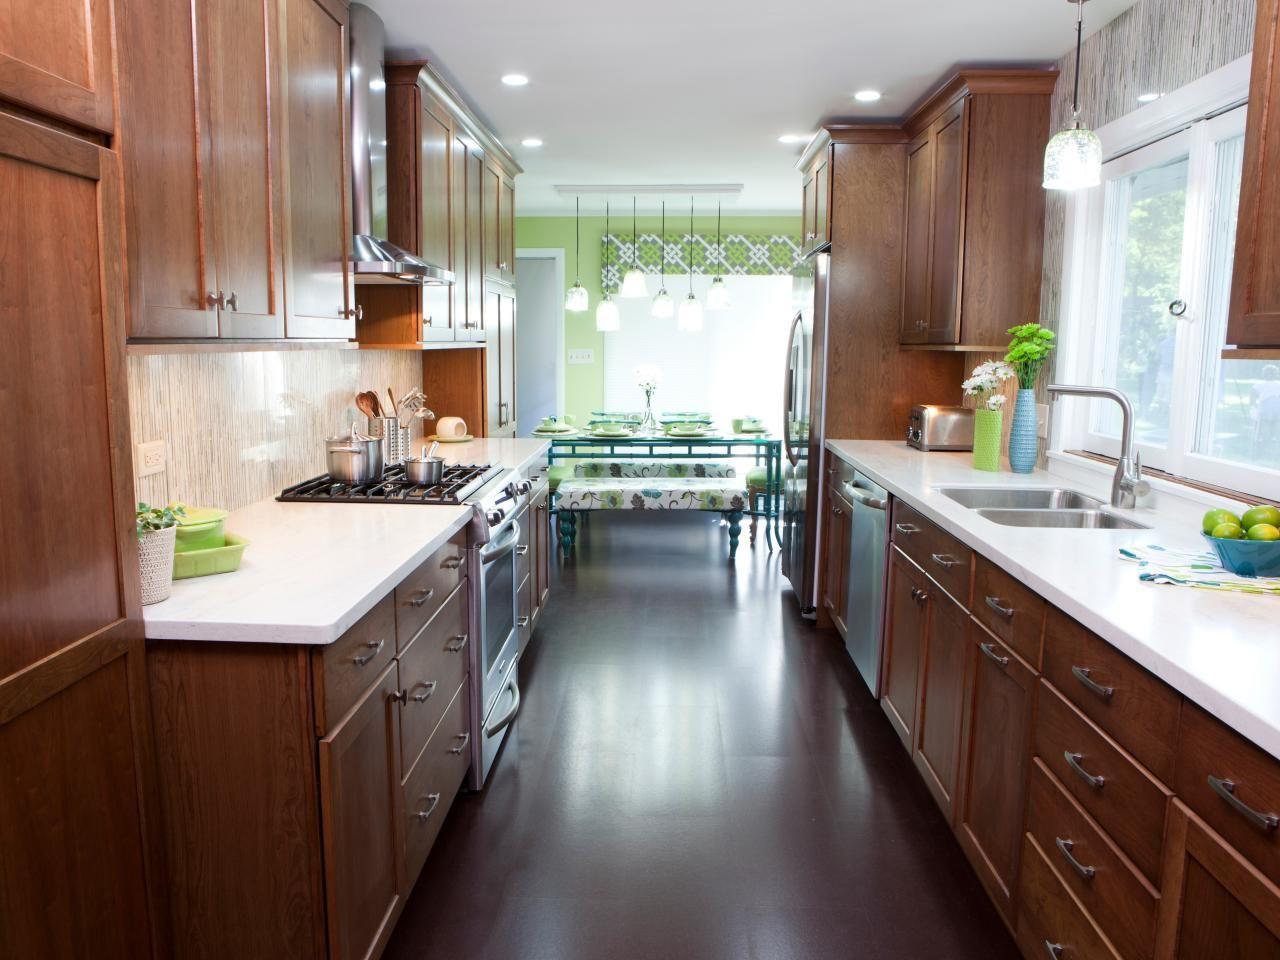 Galley Kitchen Designs Galley kitchens, Galley style